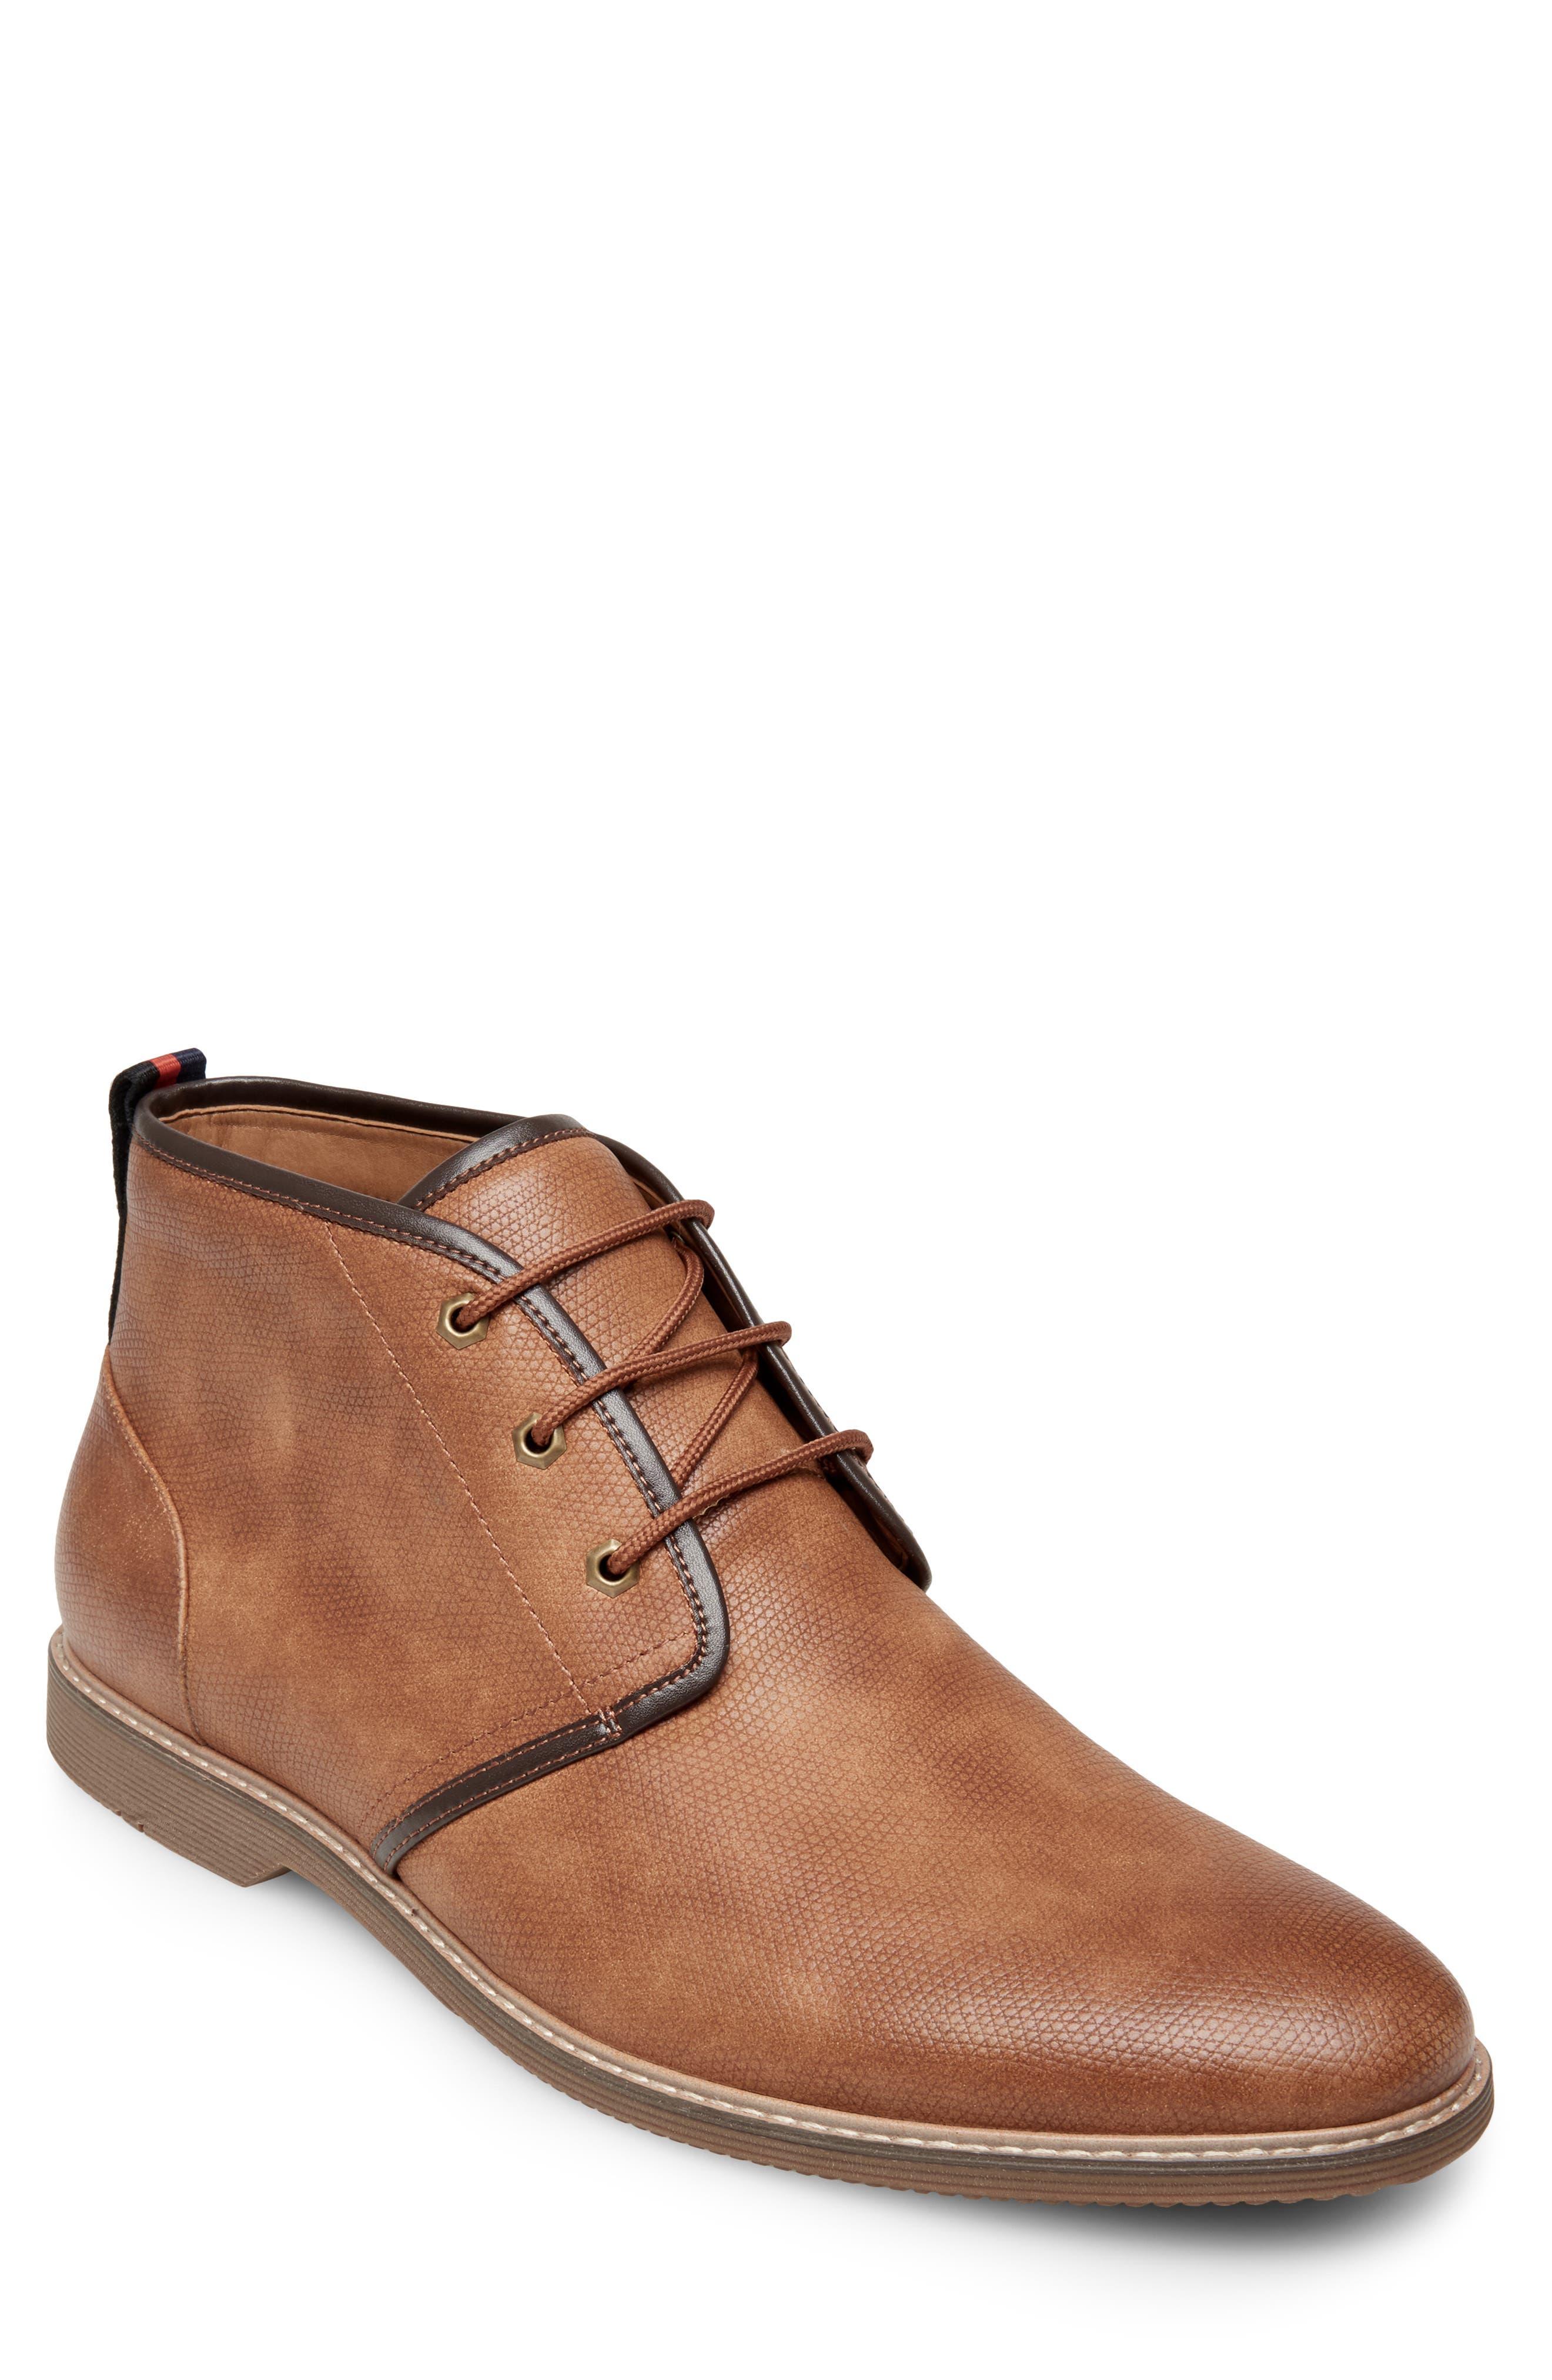 Nurture Plain Toe Boot,                         Main,                         color, TAN LEATHER